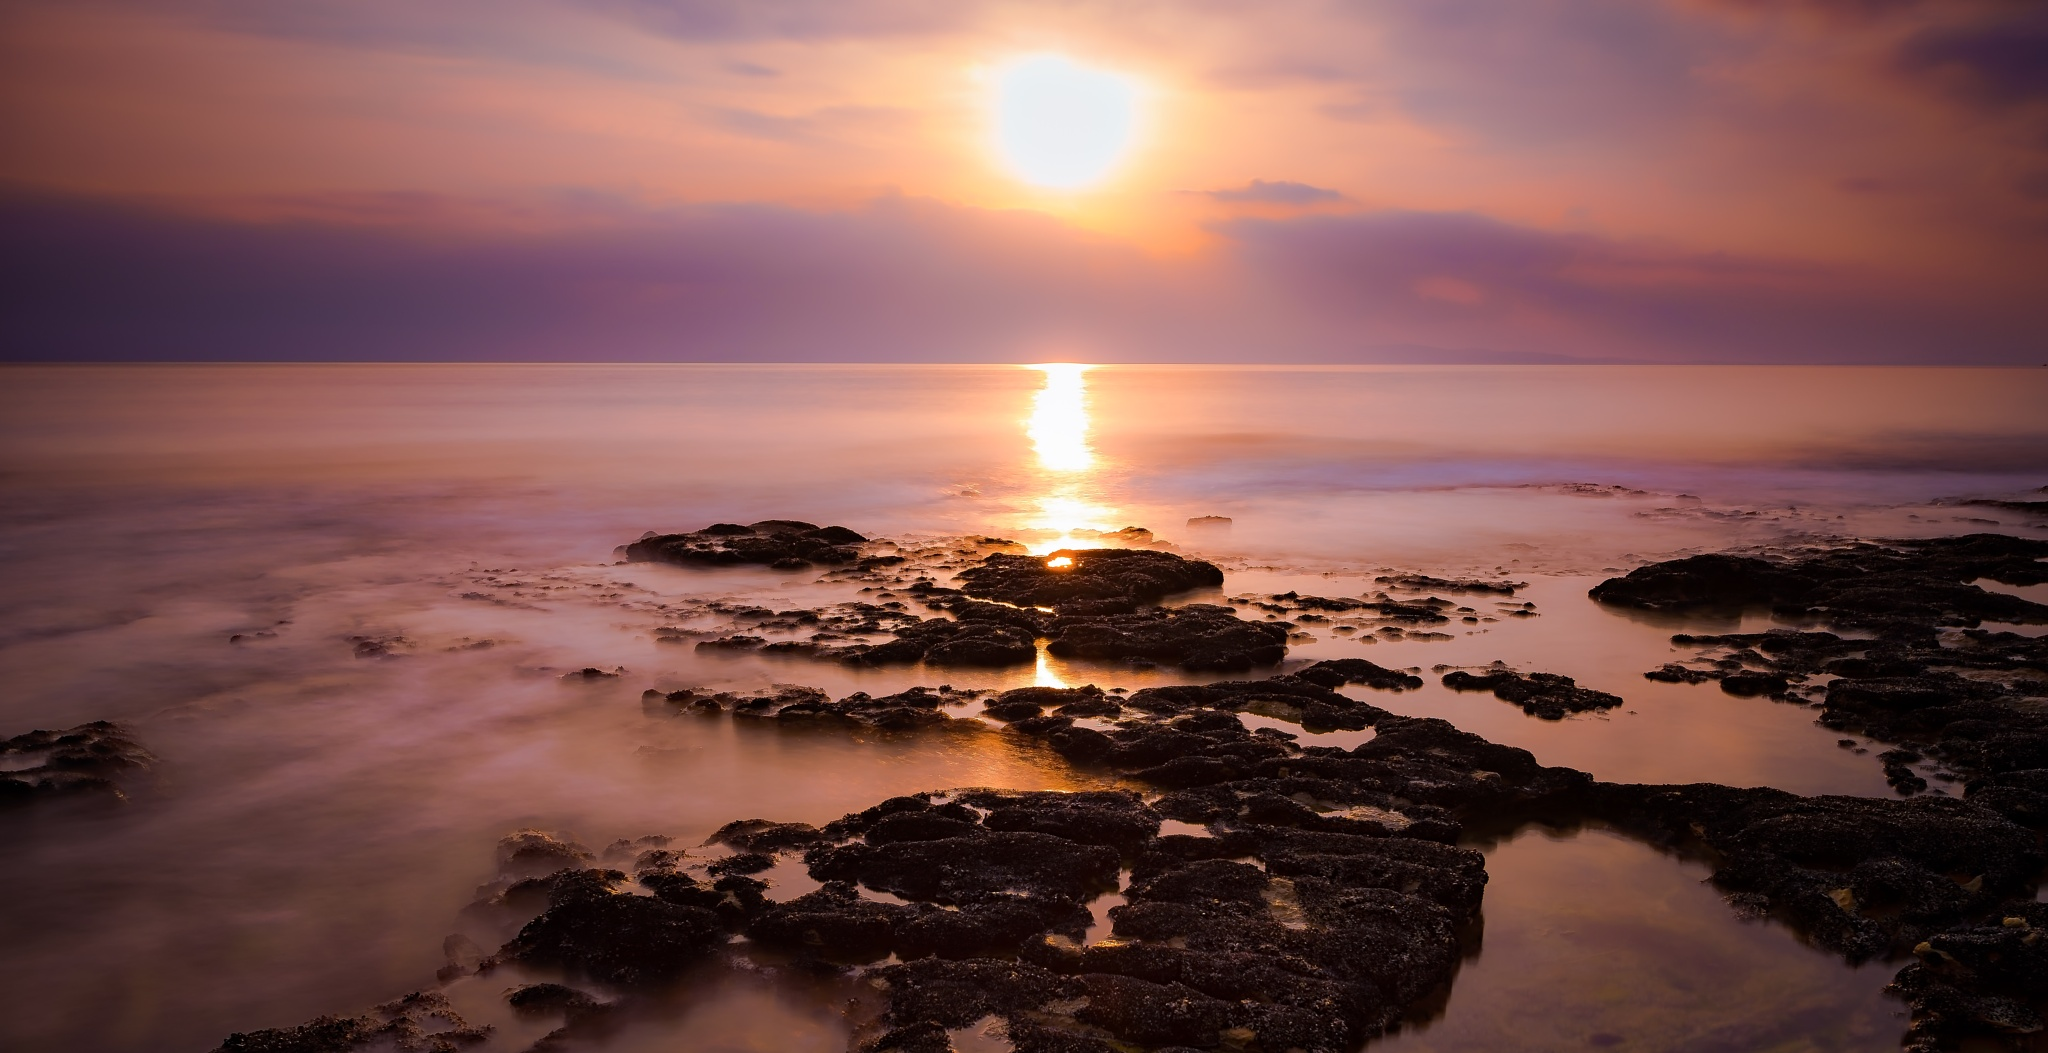 Sunrise by CamHadlowPhotography